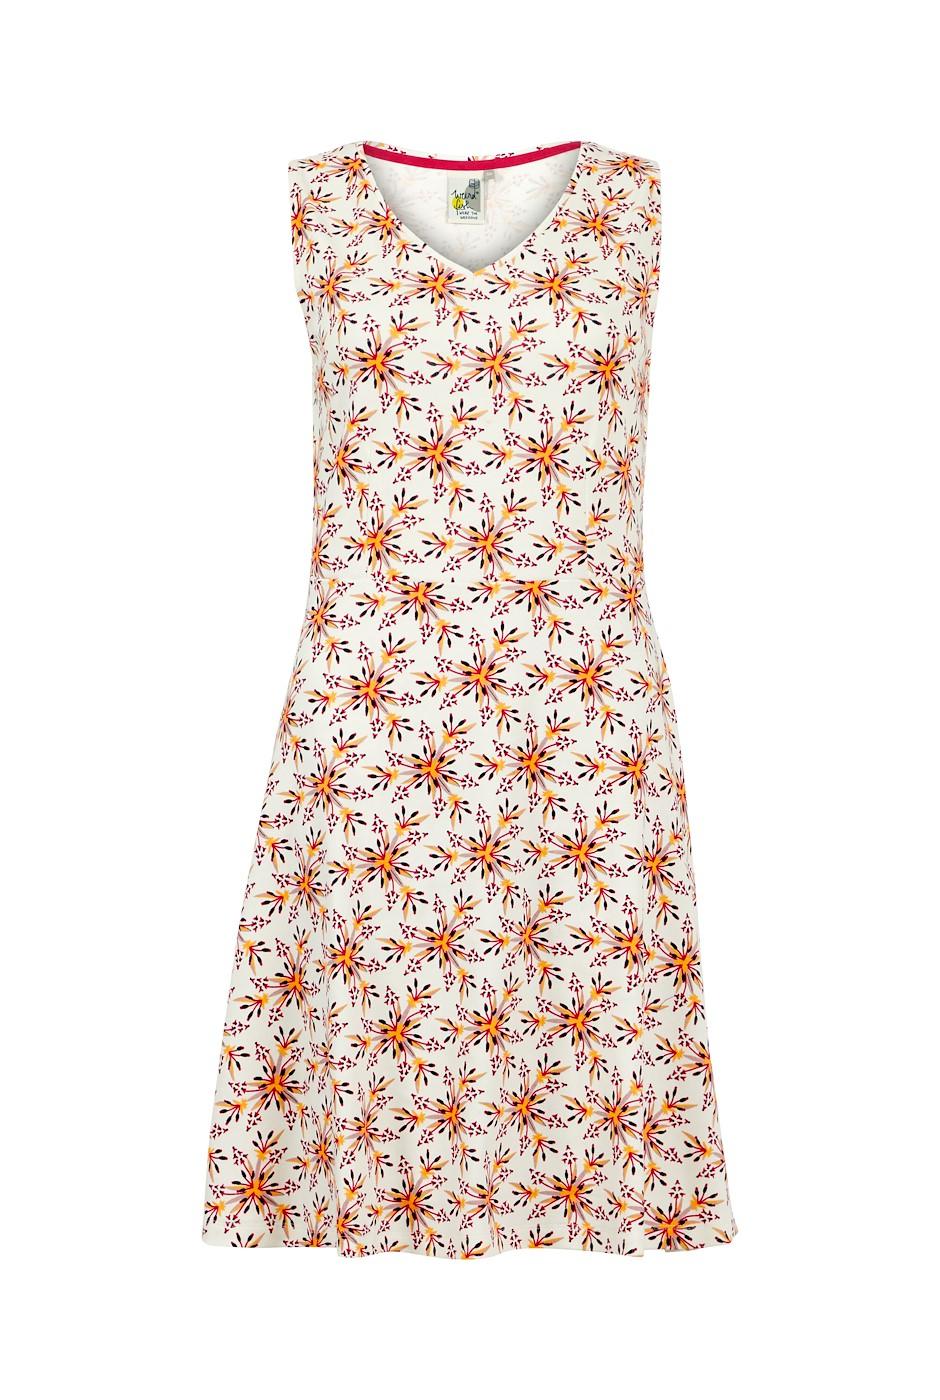 Paisley Organic Cotton Printed Jersey Dress Light Cream